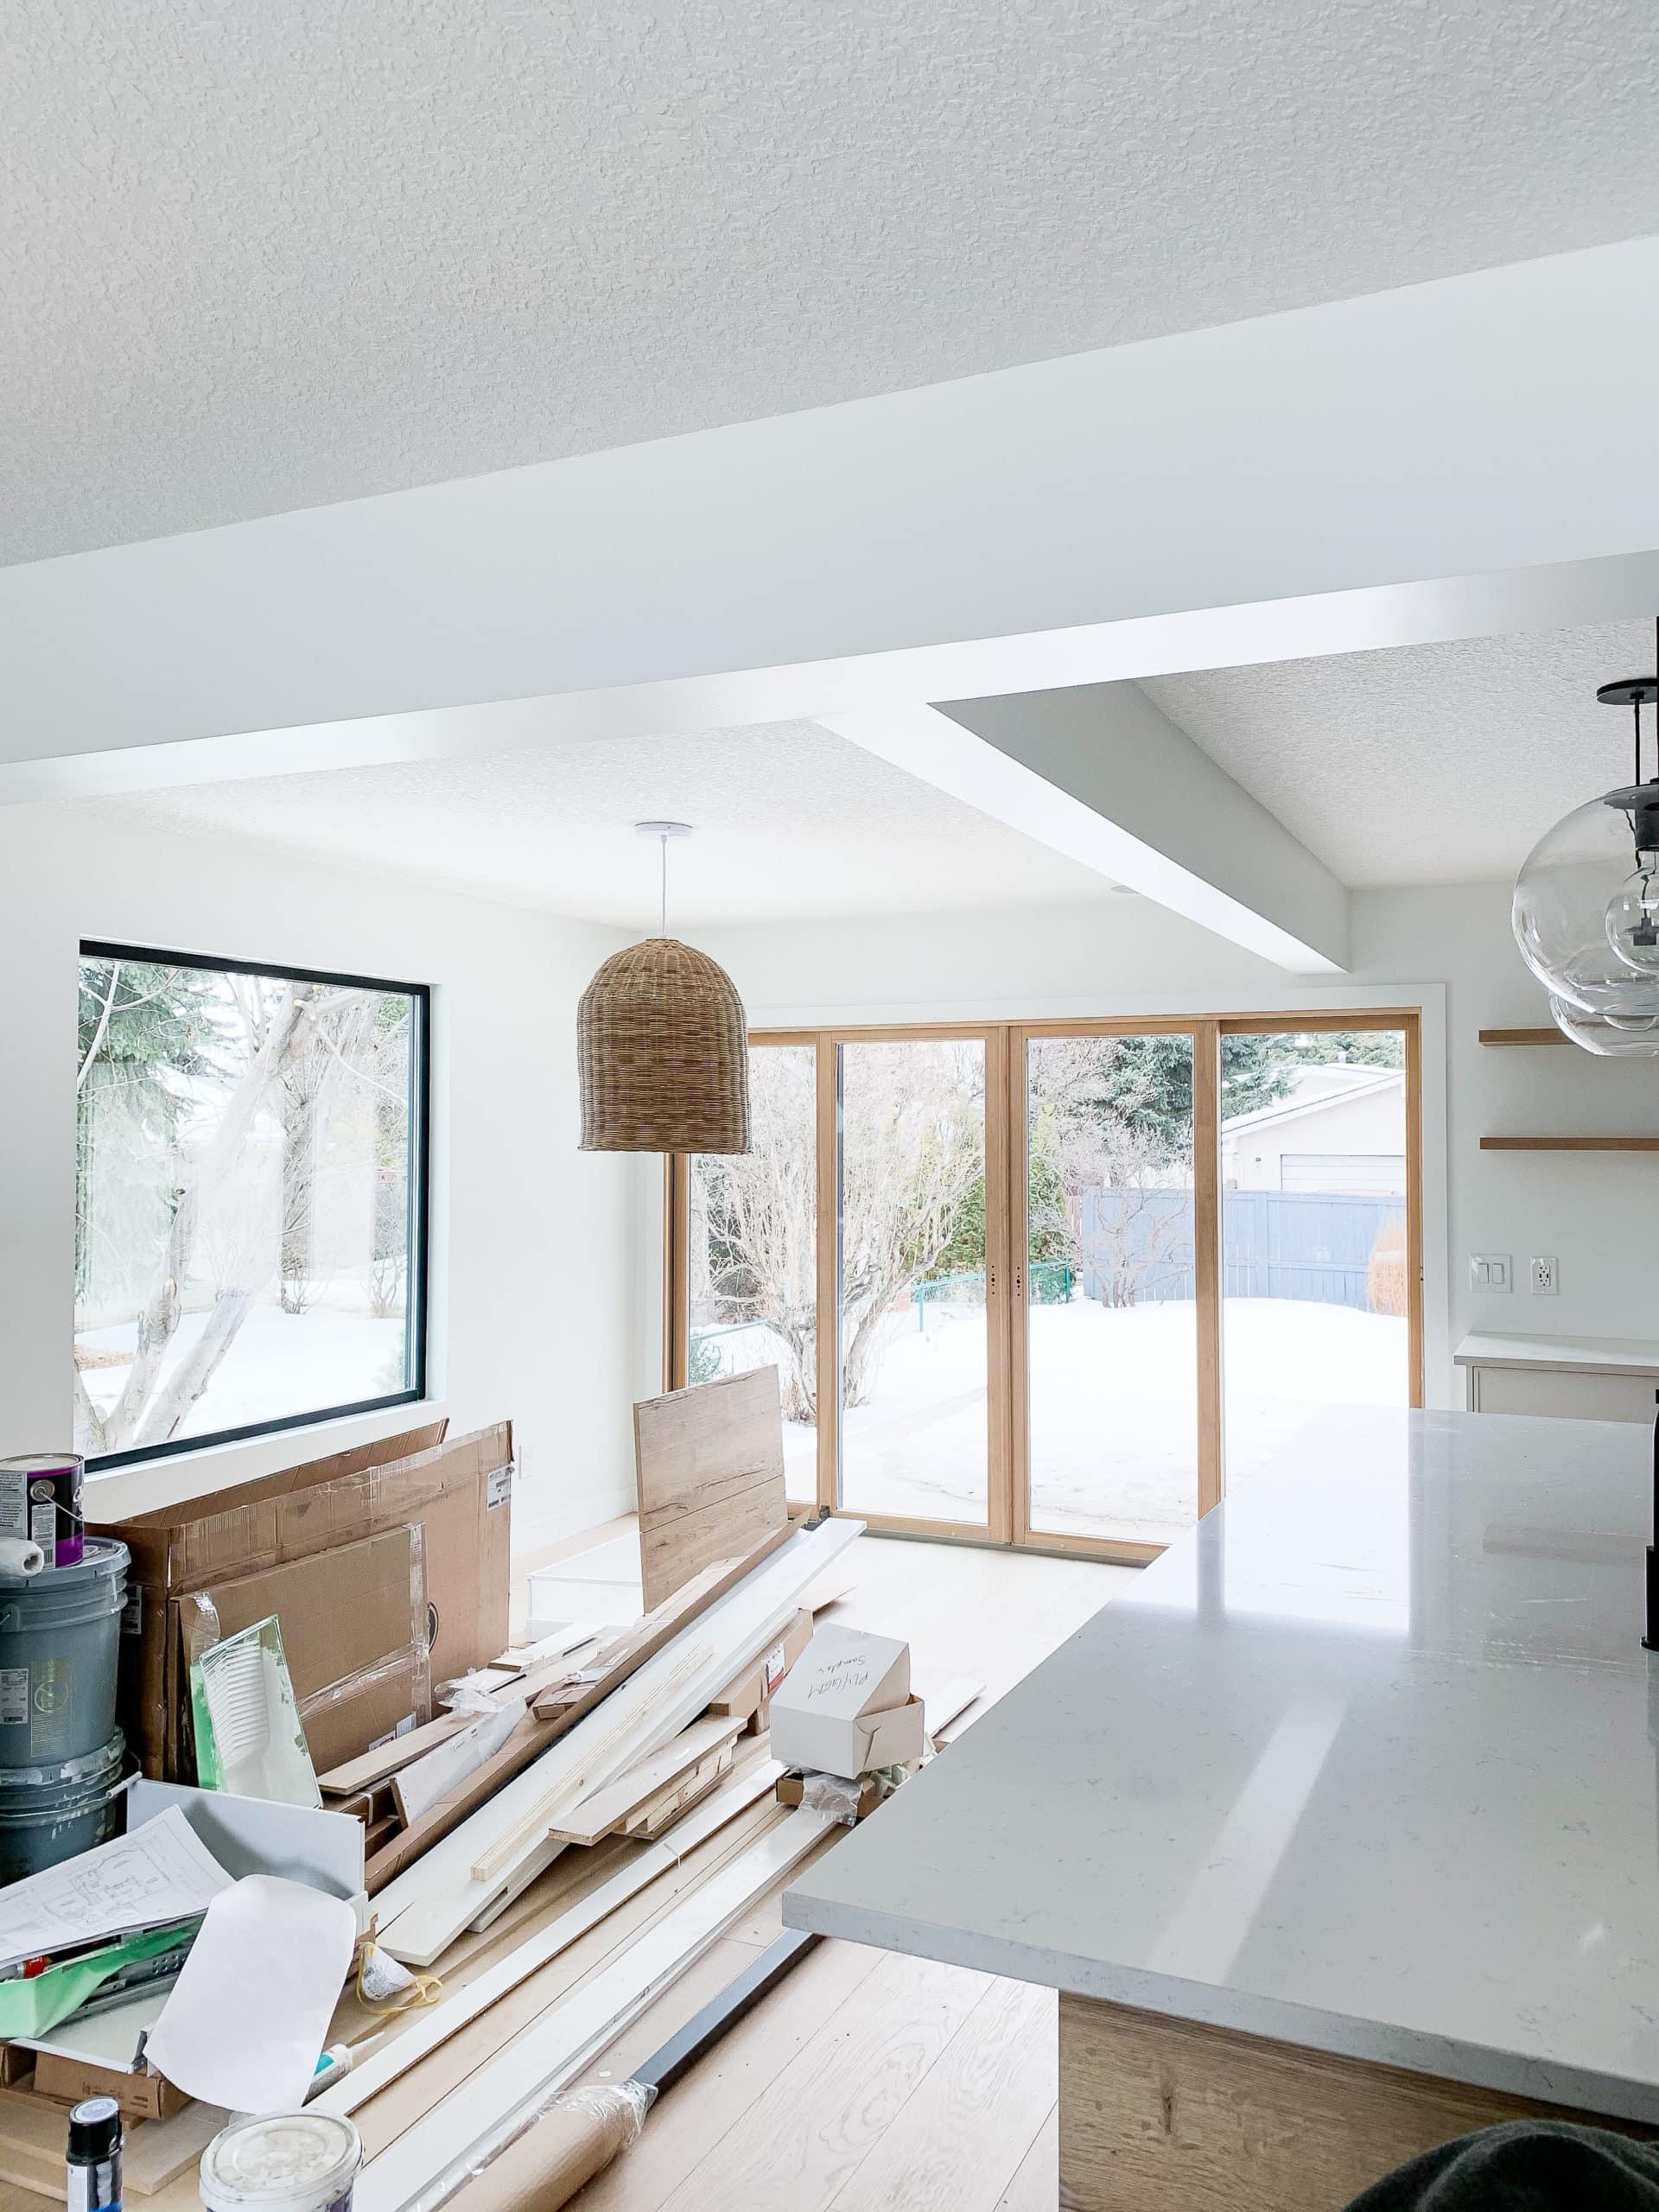 Full Home Renovation - Earthy Coastal Scandinavian California Minimal Home Remodel